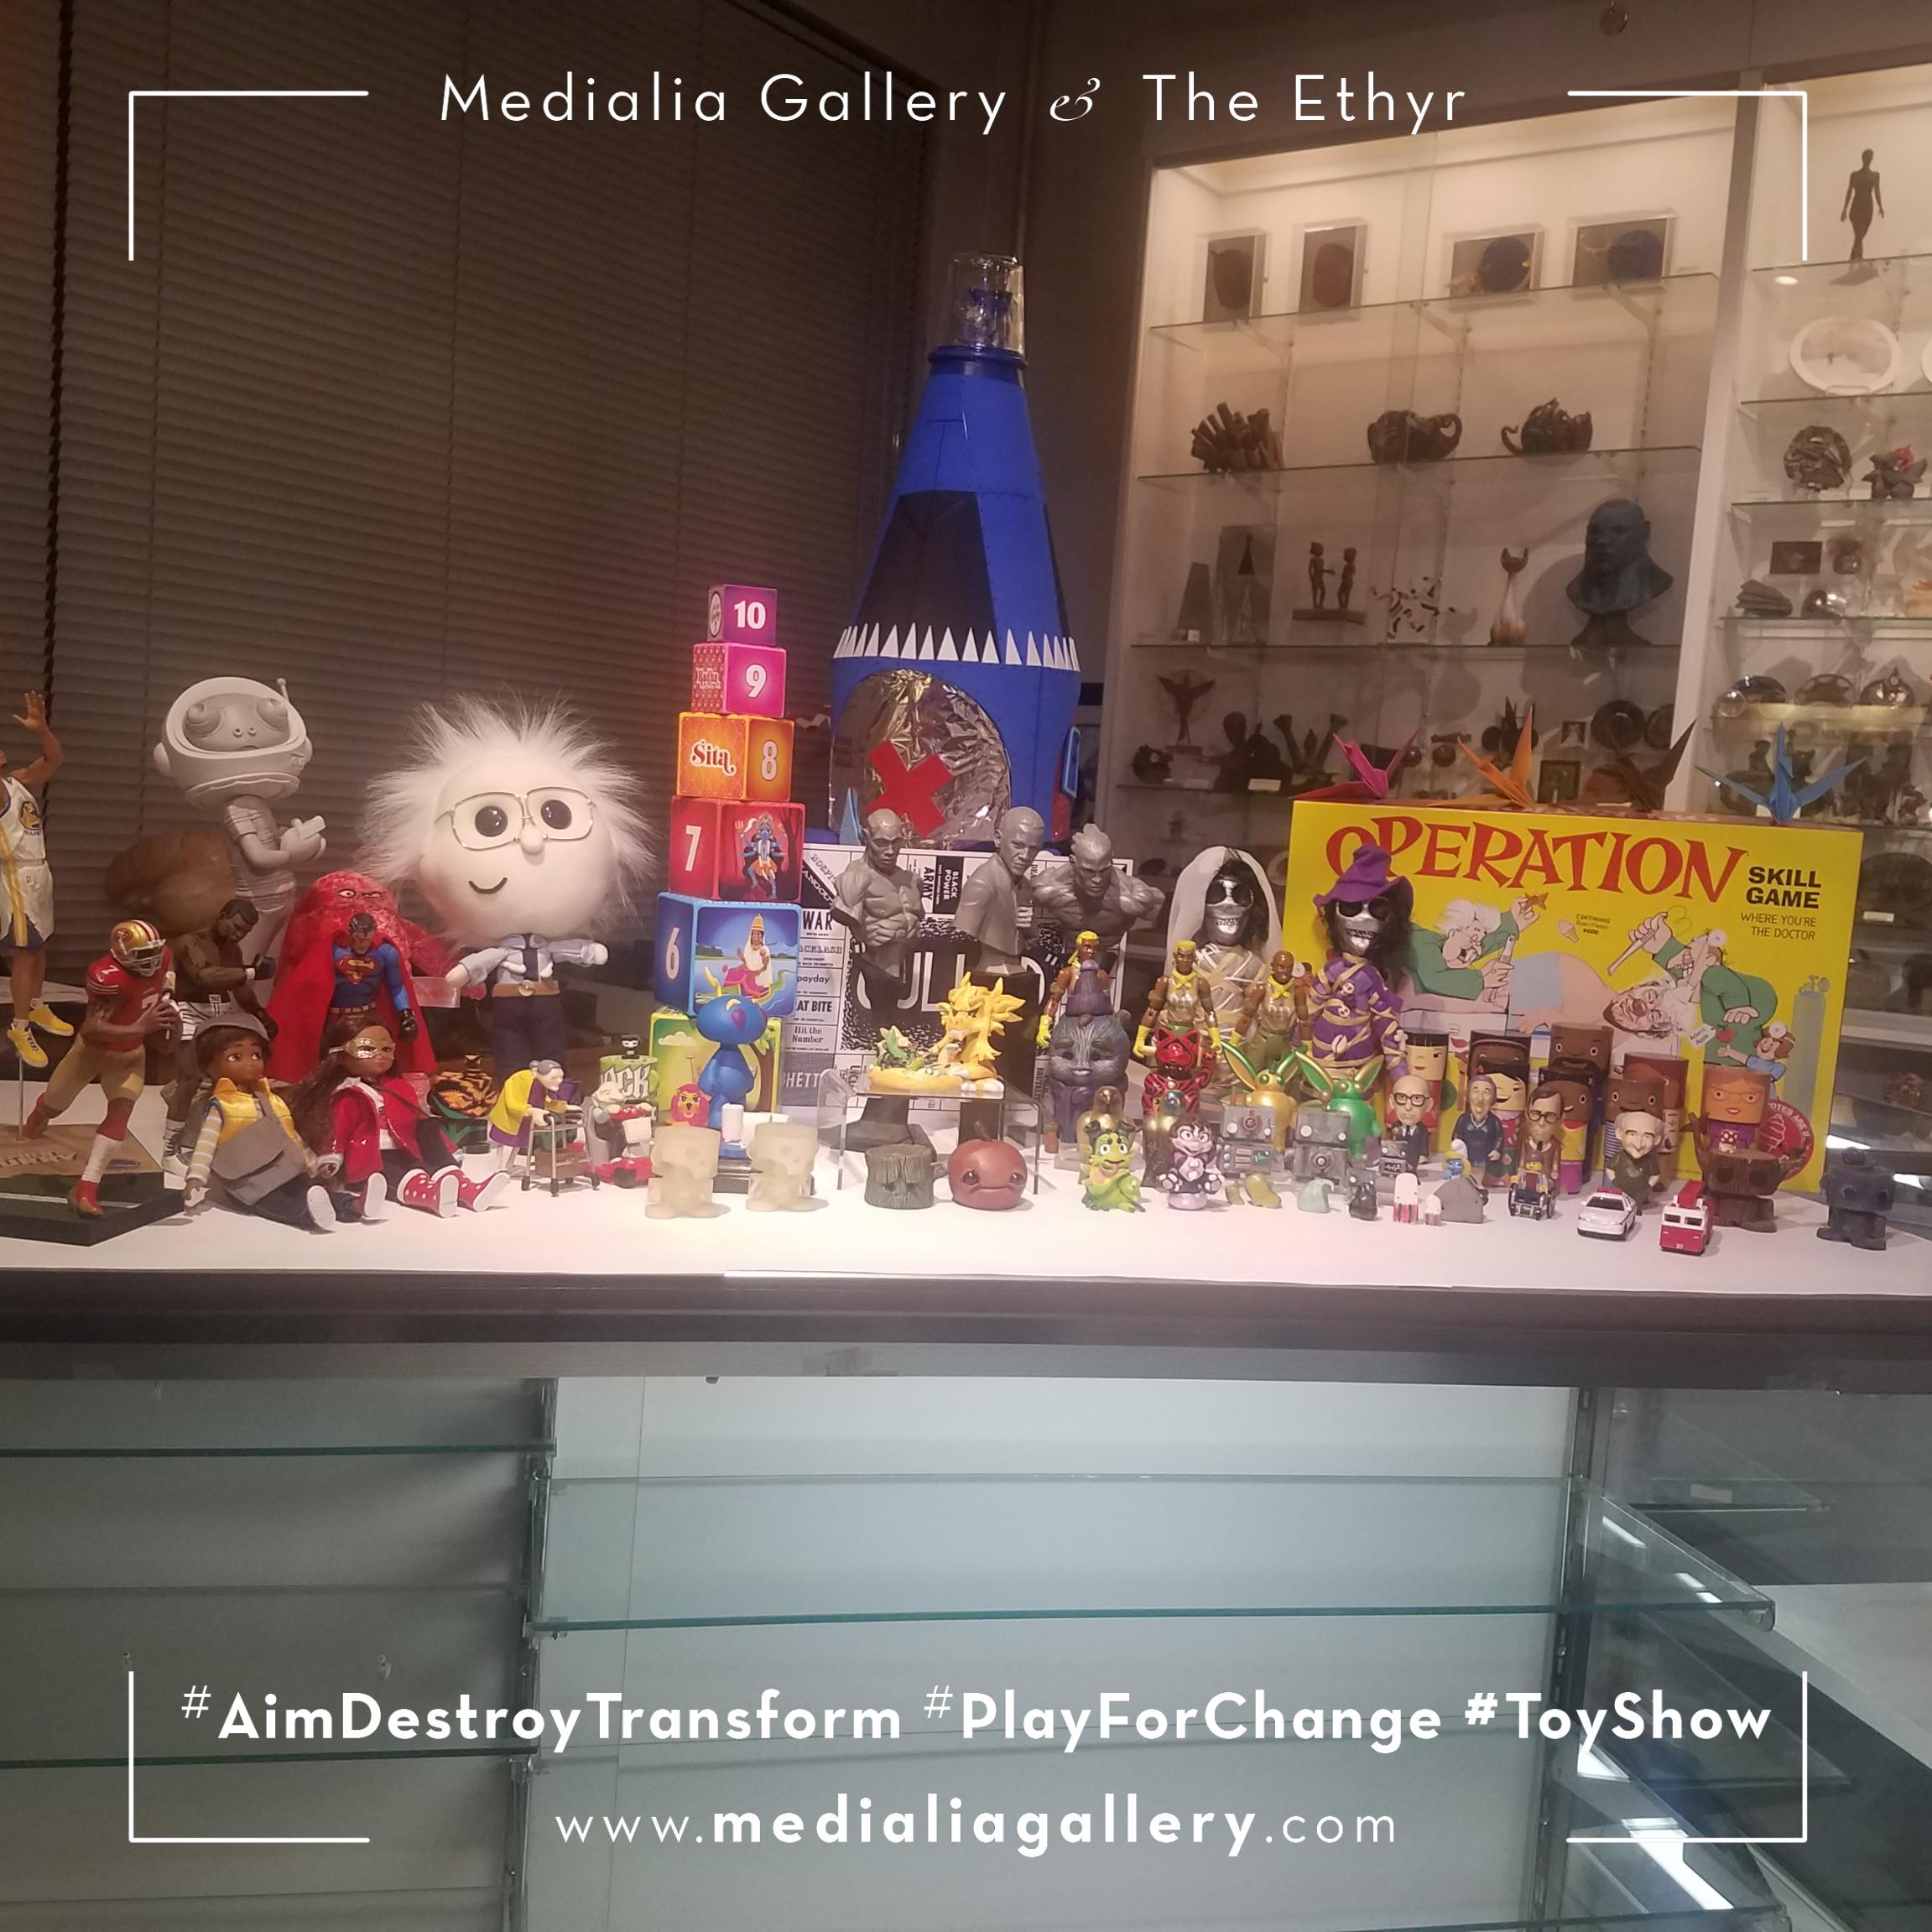 MedialiaGallery_The_Ethyr_AimDestroyTransform_Toy_Show_NYC_Tour_Group_Medialia_November_2017.png